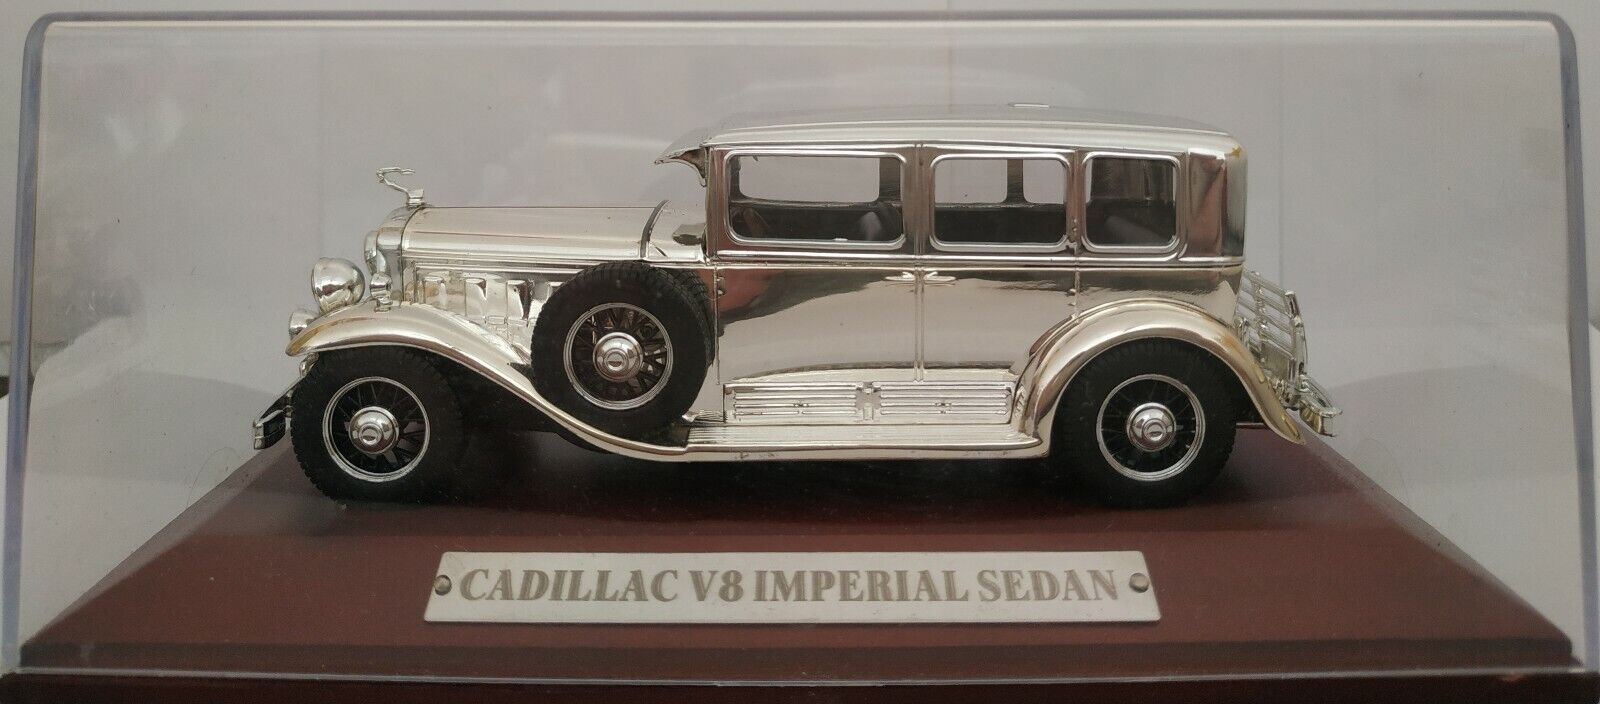 1 43 ILLAC V8 IMPERIAL CROMO argent CHROME CROMADO IXO ALTAYA ESCALA DIECAST